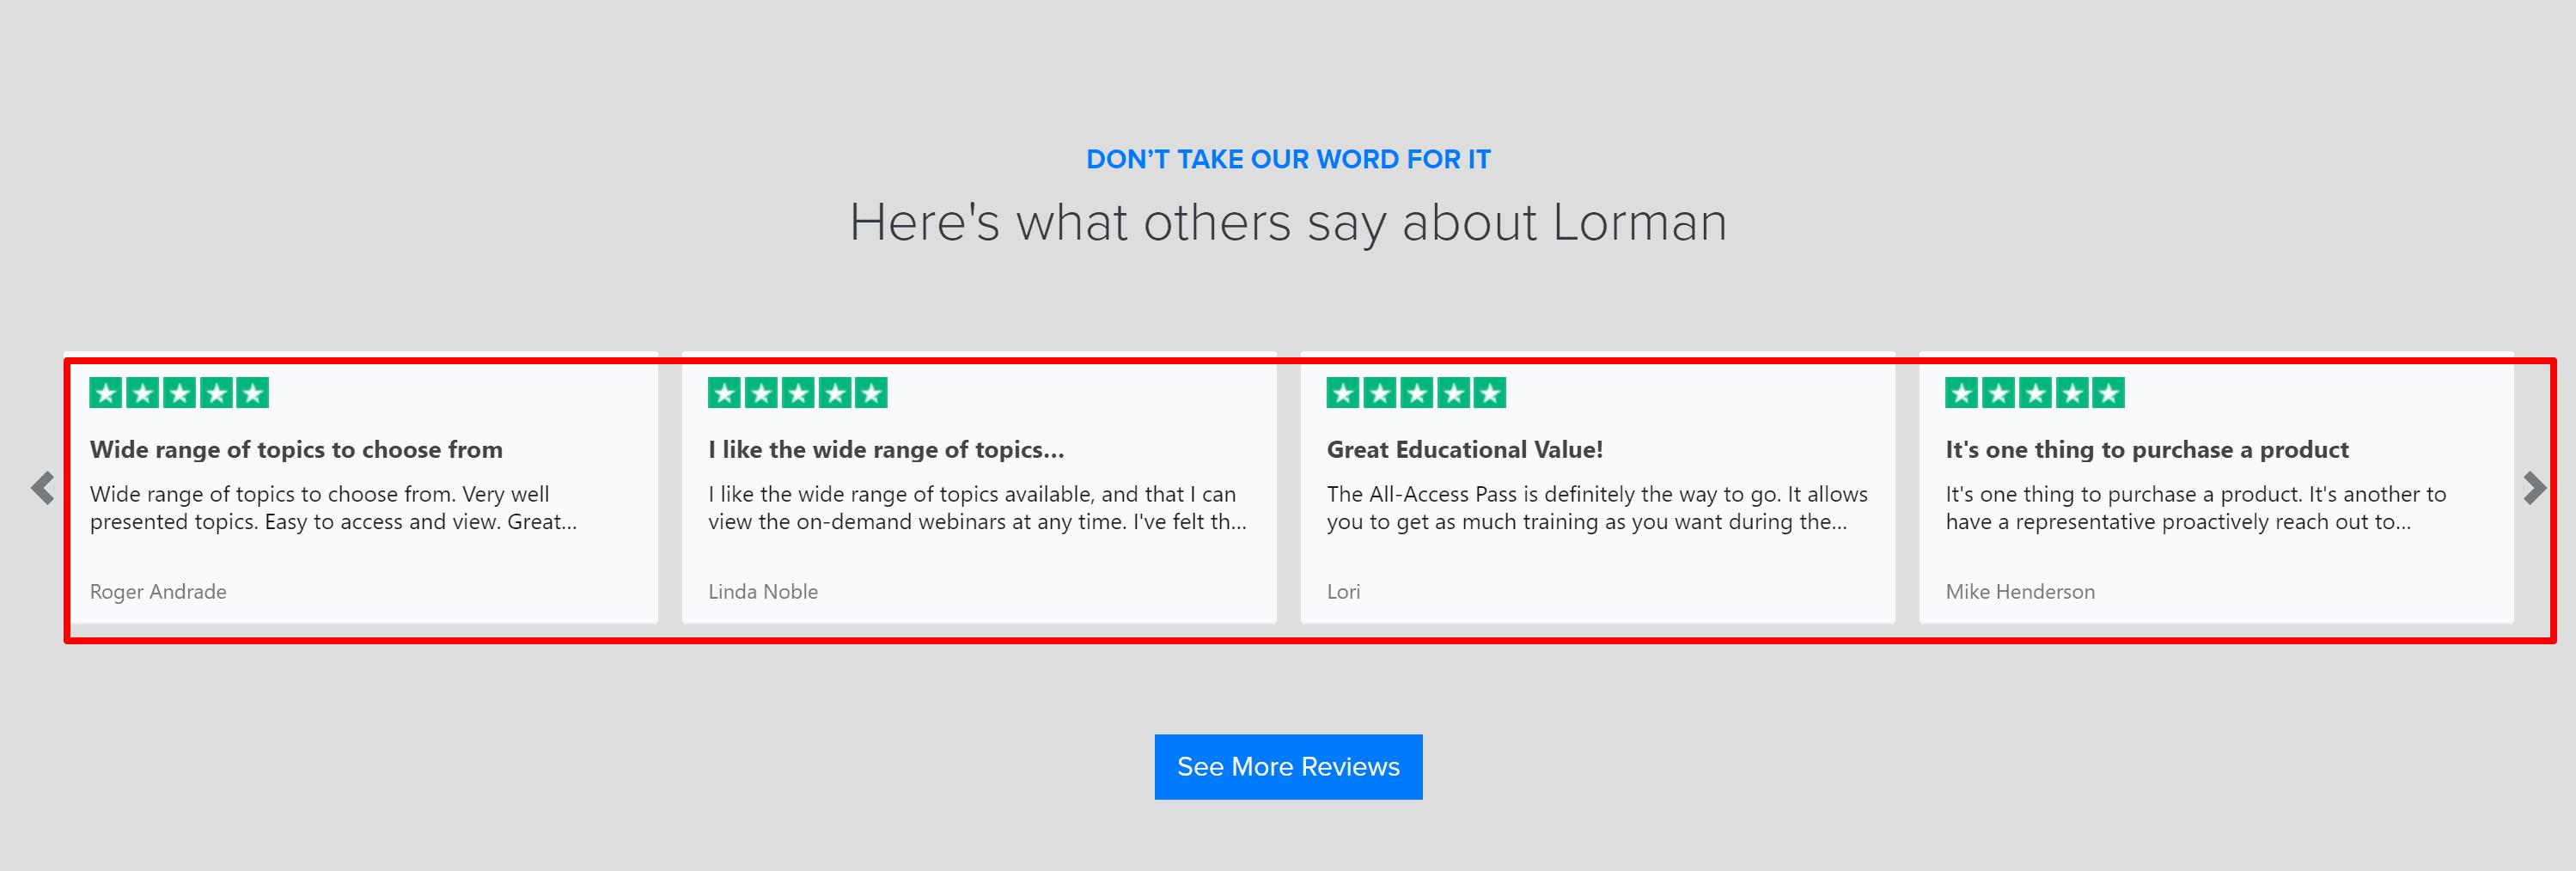 Lorman customer reviews and testimonials